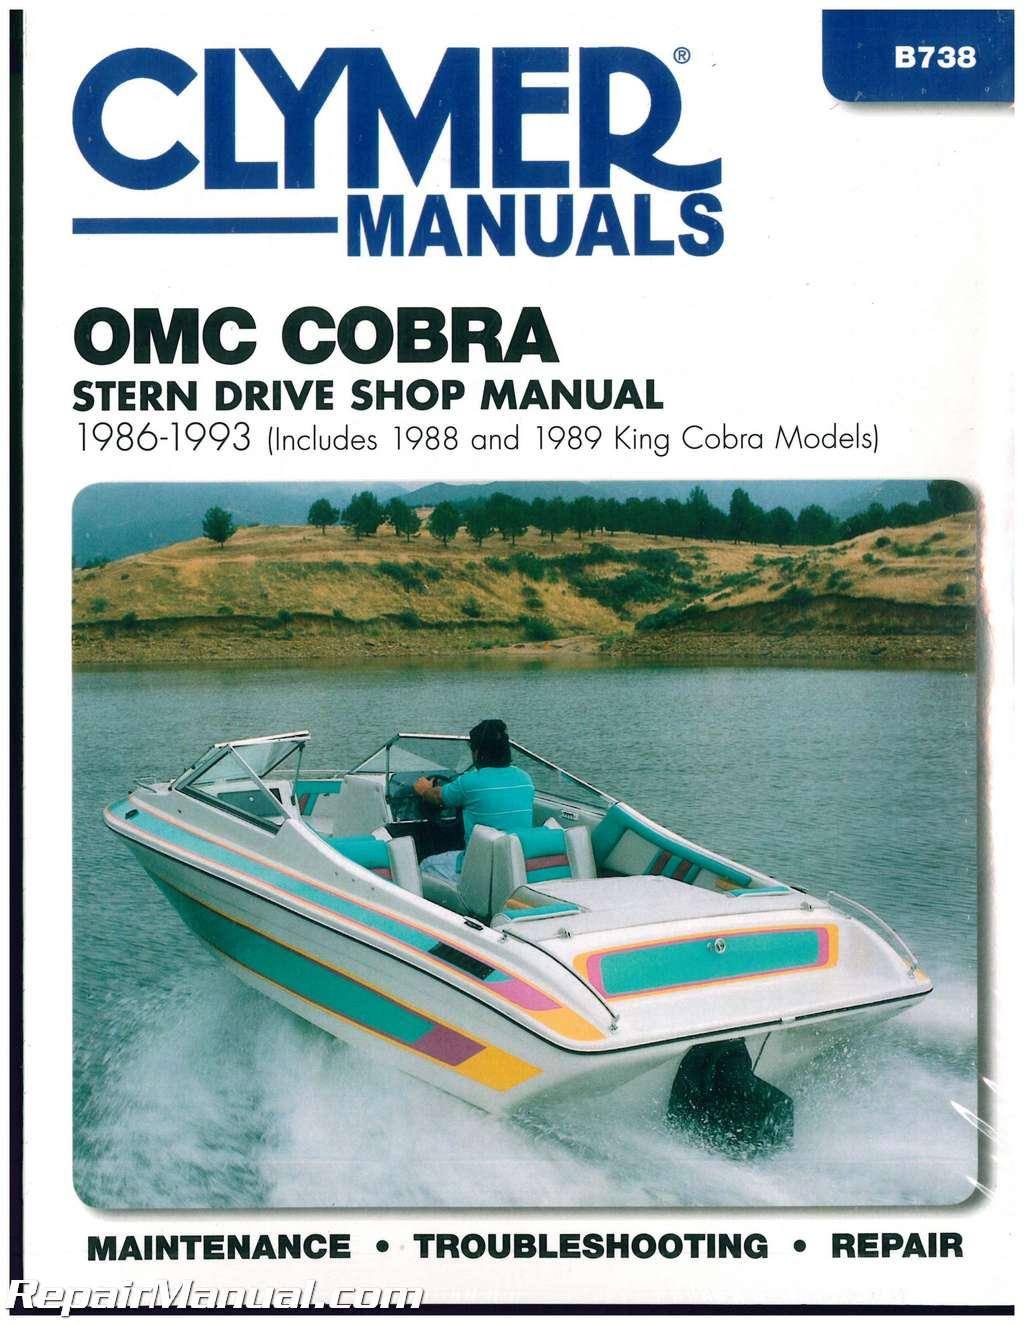 hight resolution of 93 omc wiring diagram wiring diagram weekclymer omc cobra 1986 1993 stern drive boat engine repair